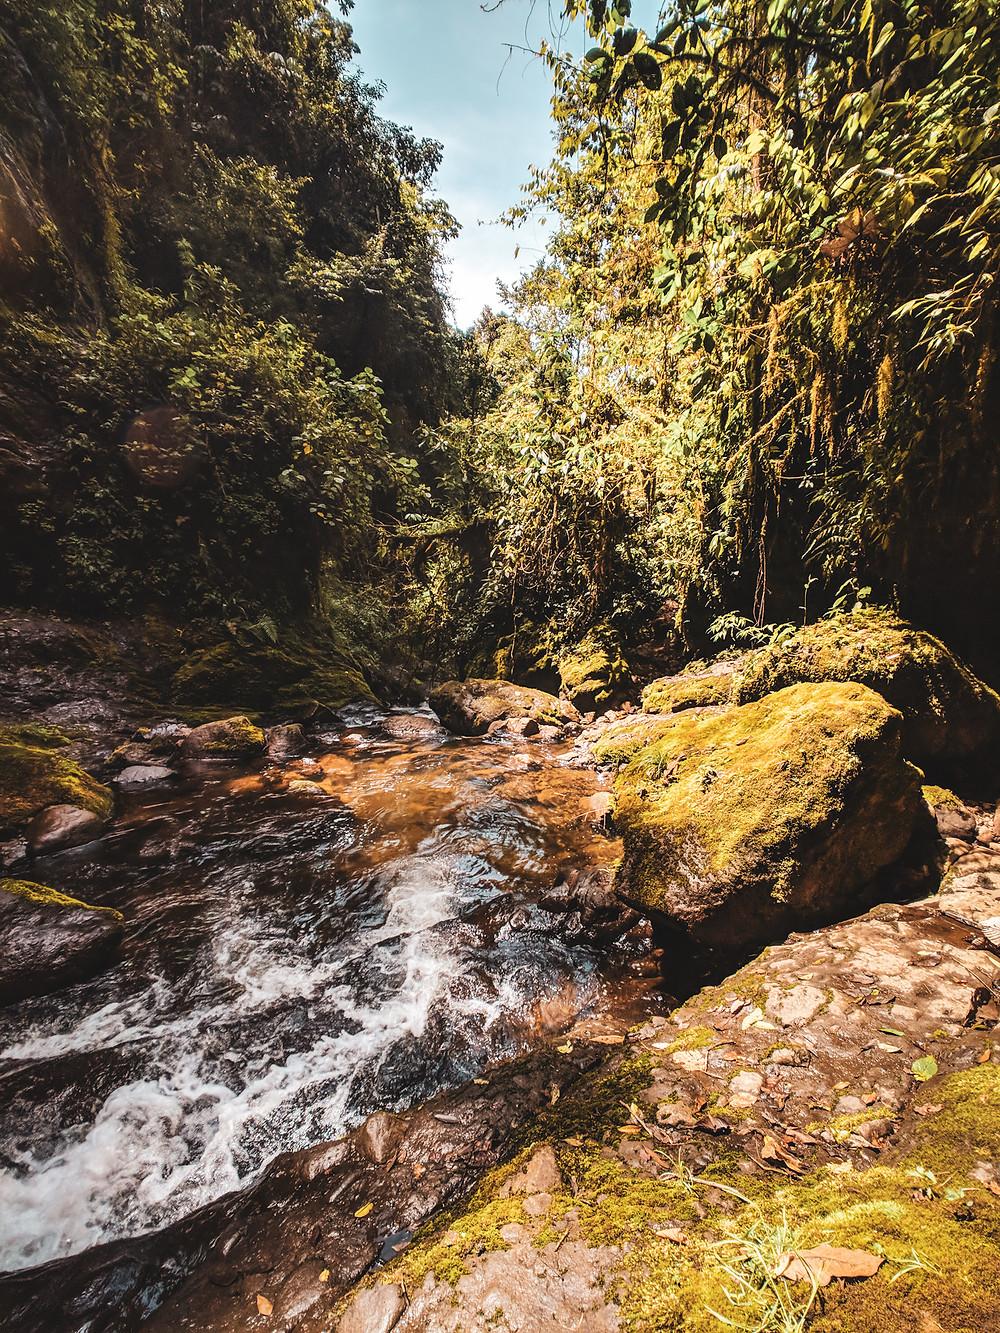 River in Jardin, Colombia.